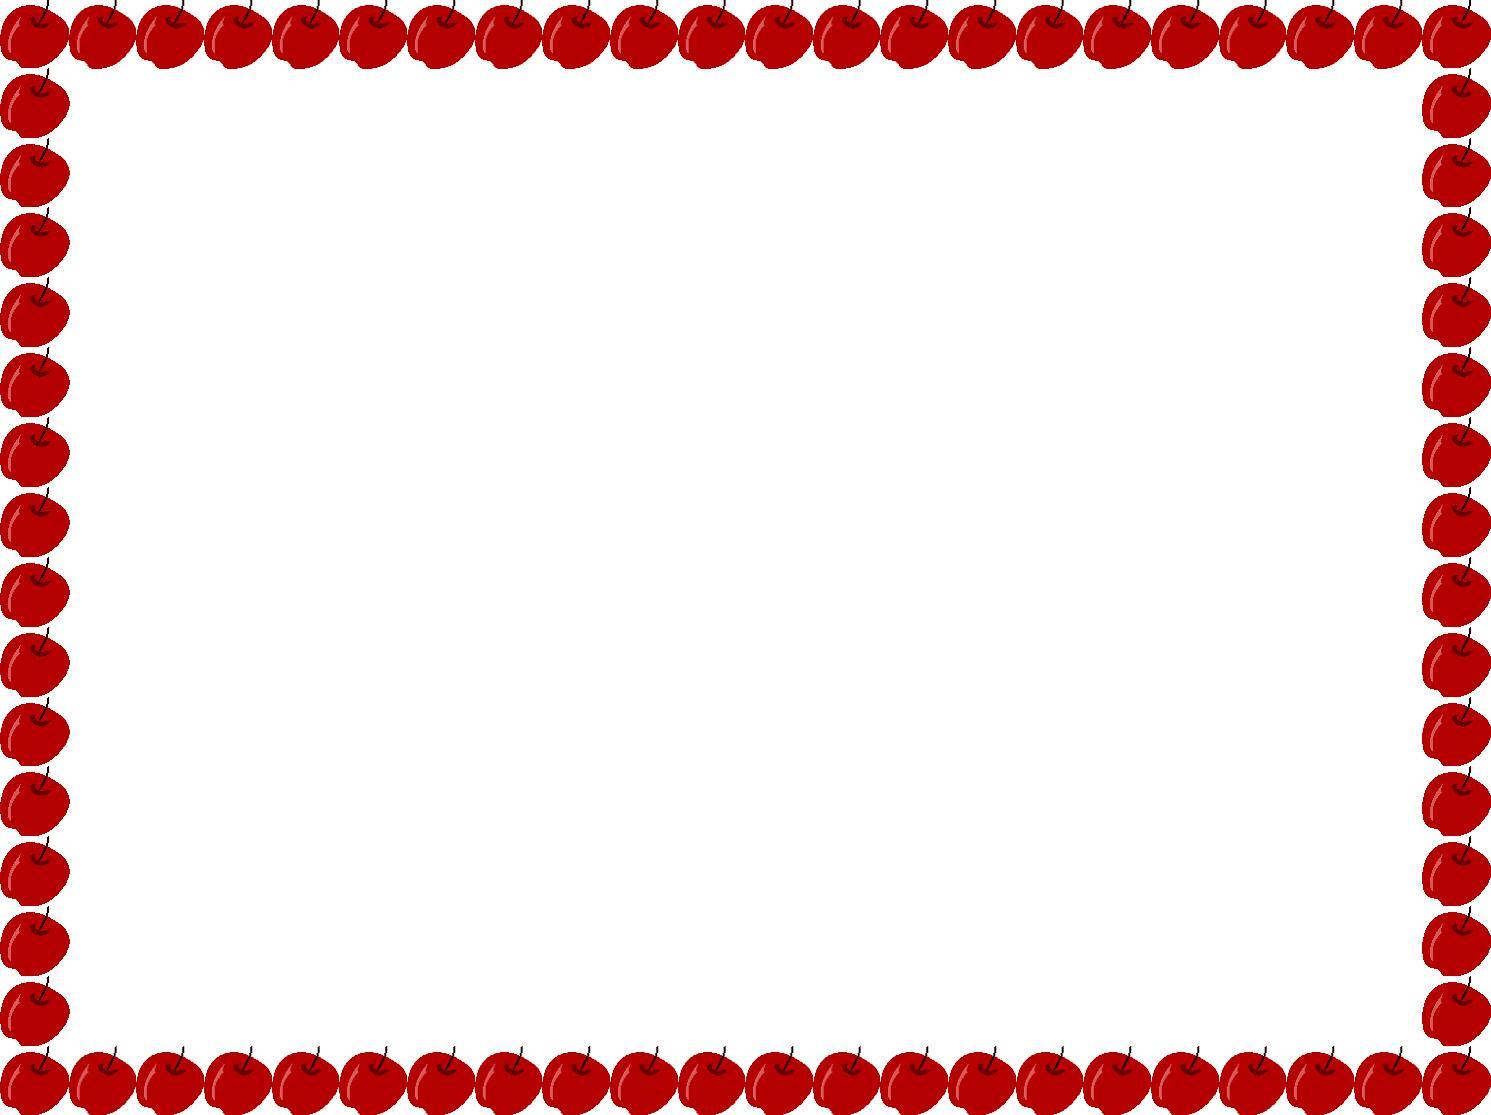 1491x1115 Apple Clipart Borders